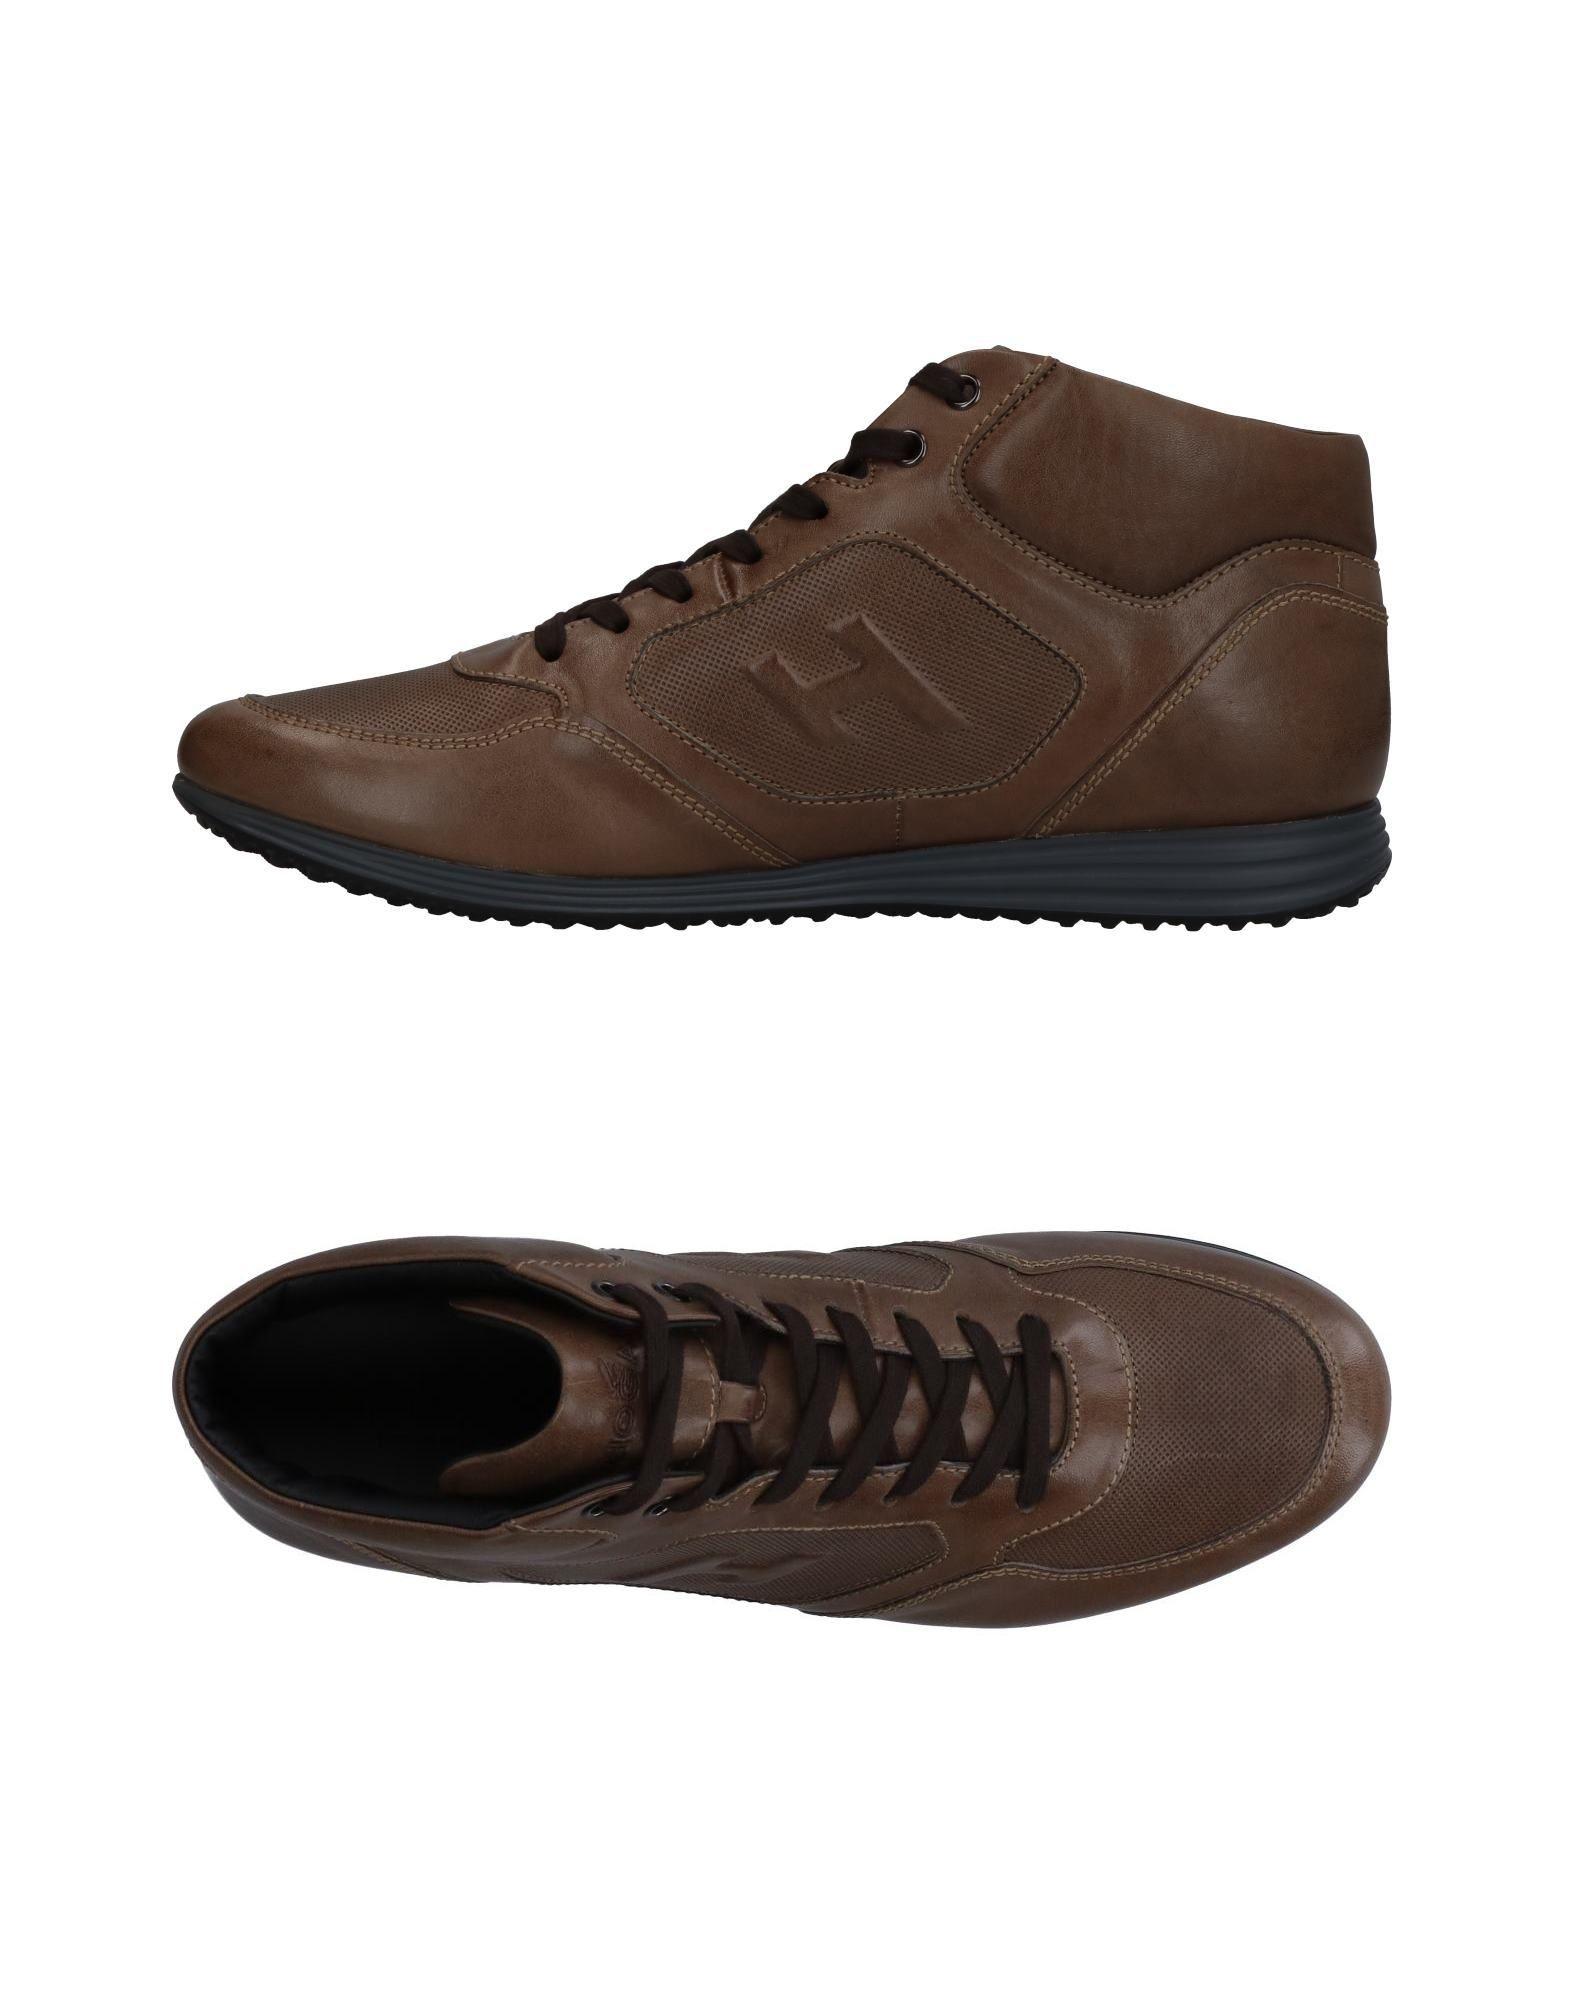 HOGAN Высокие кеды и кроссовки кеды кроссовки высокие dc council mid tx stone camo